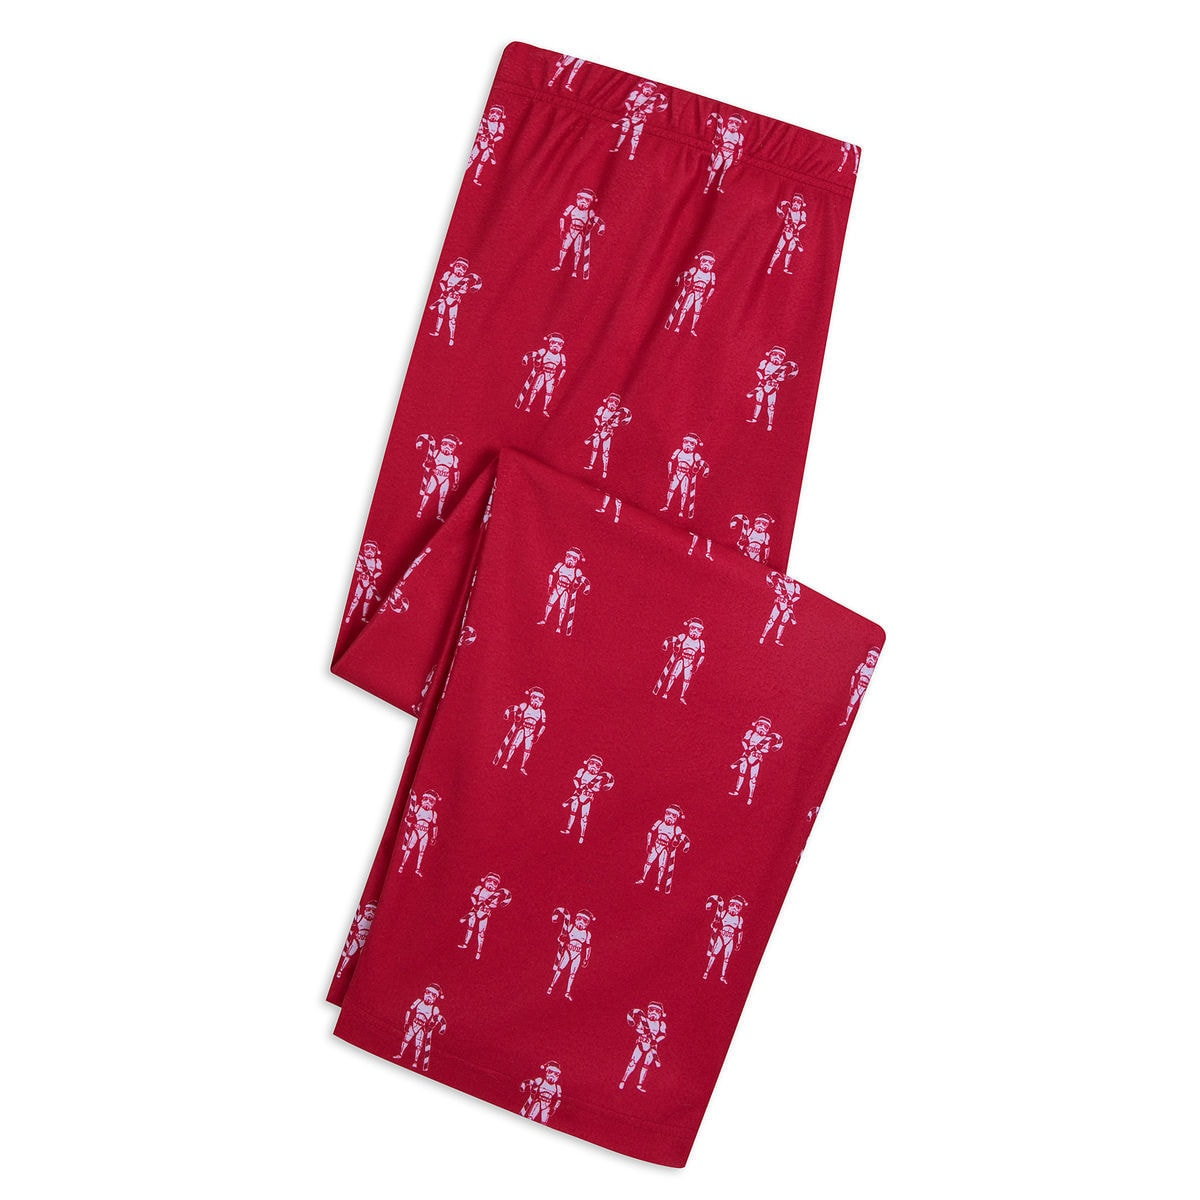 25d6a12910b6 Stormtrooper Pajama Set for Men by Munki Munki